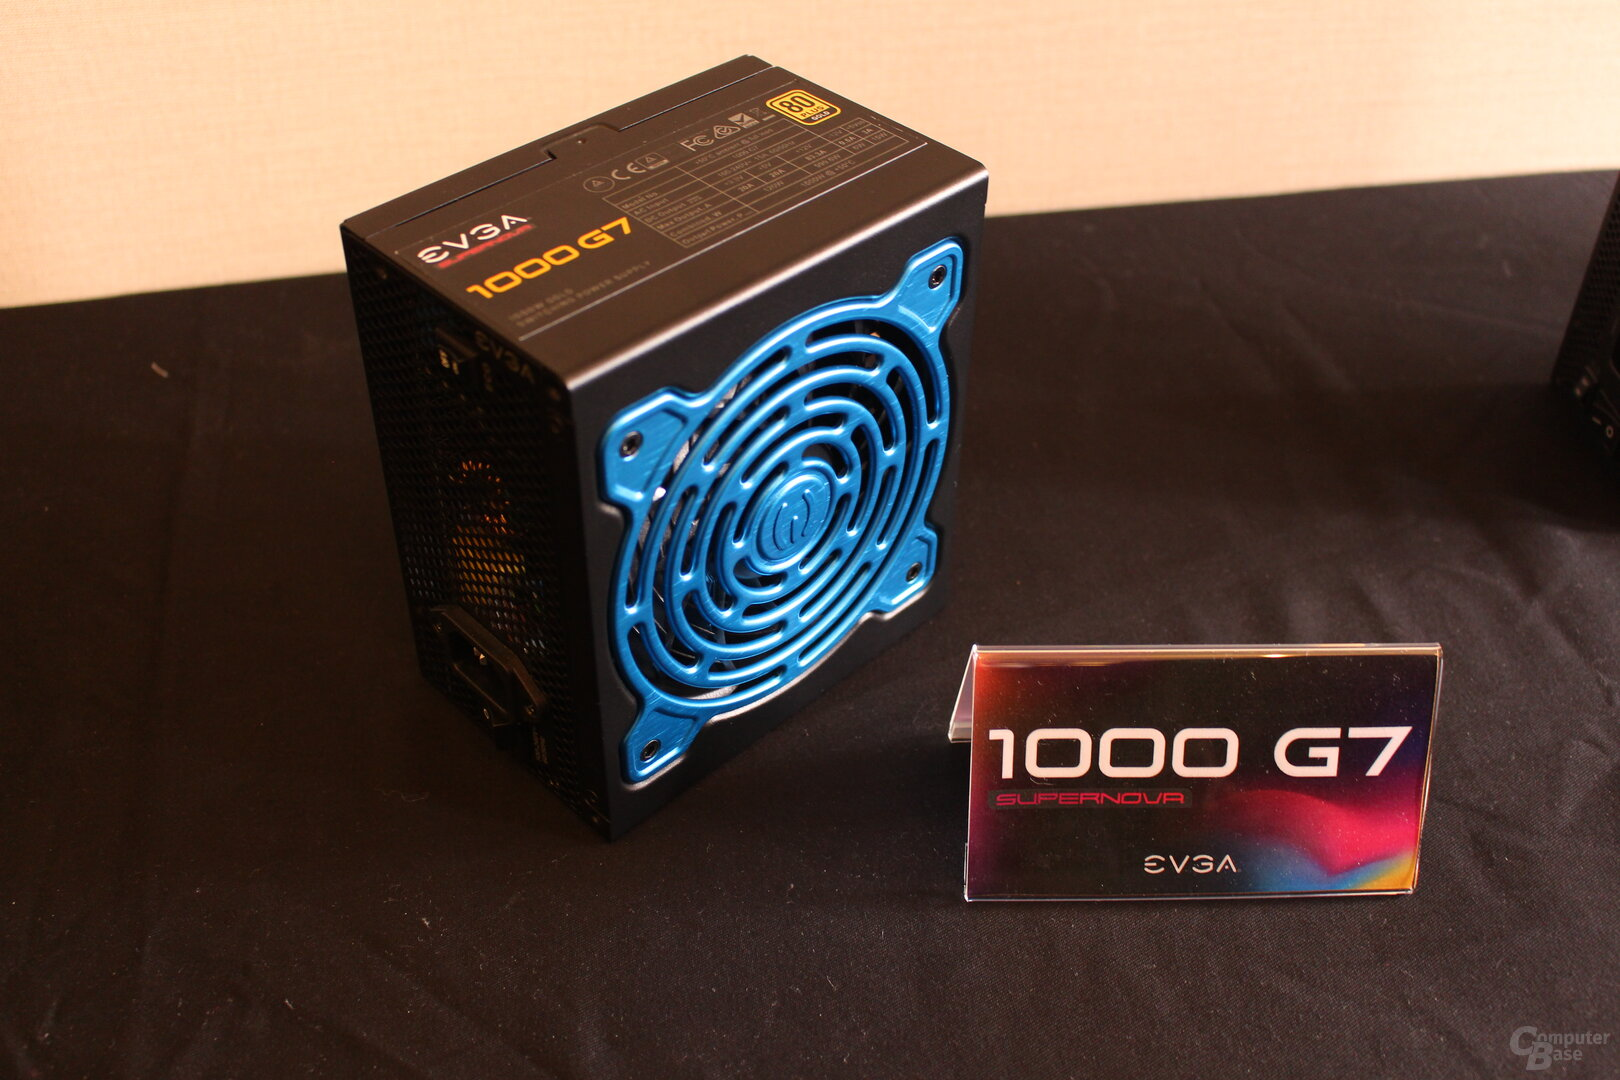 EVGA 1000 G7